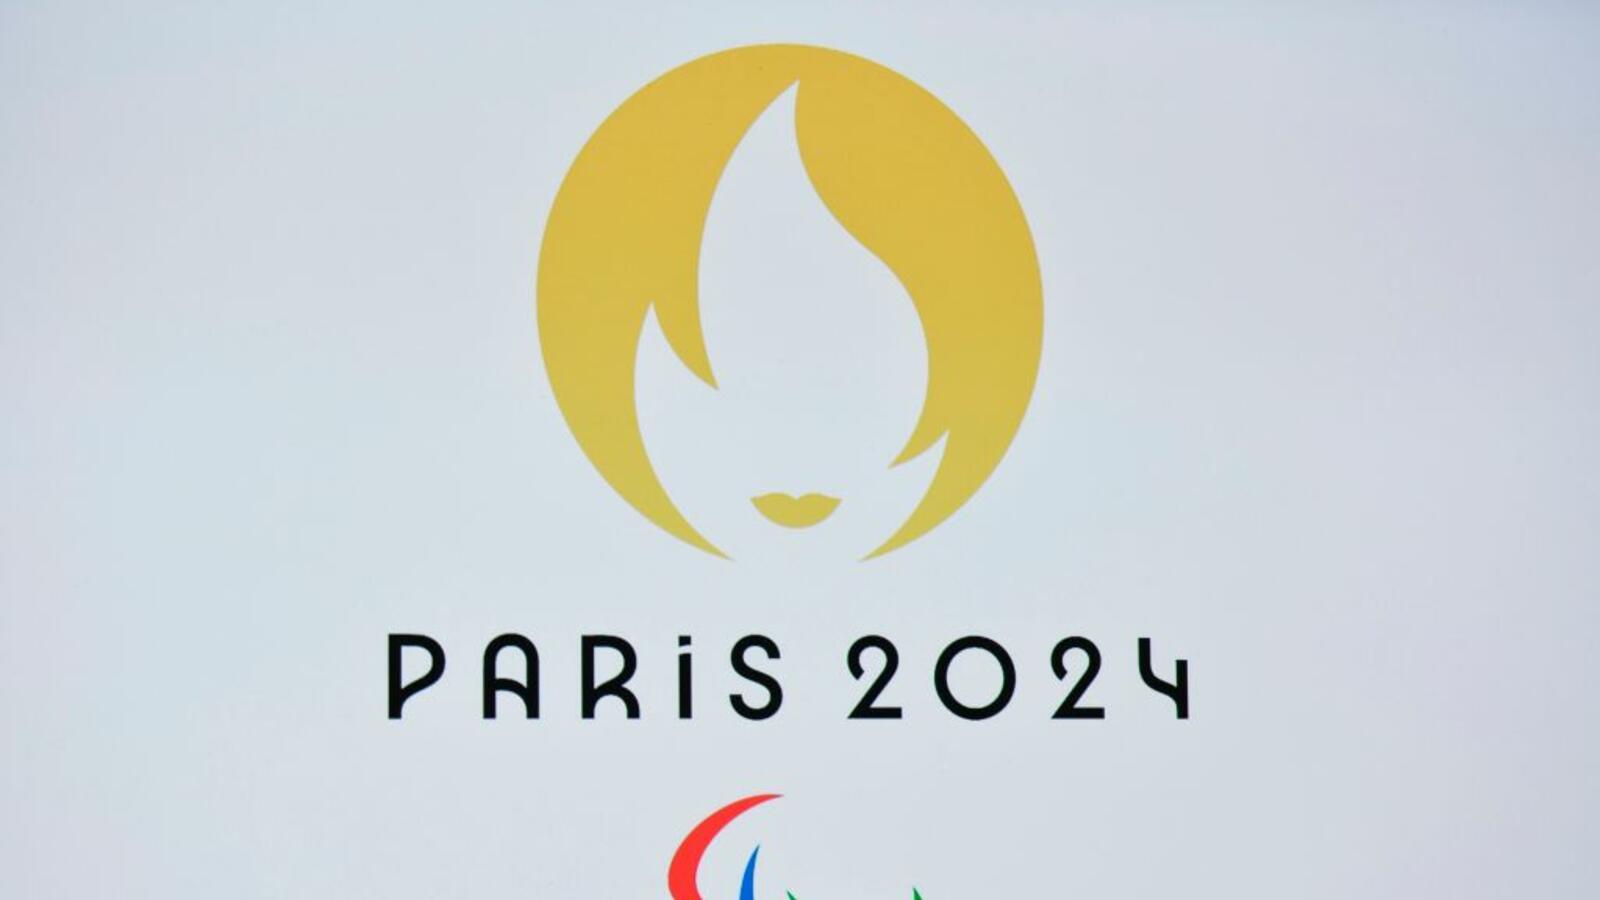 Paris 2024 Olympics Logo Looks Like a 'Karen'